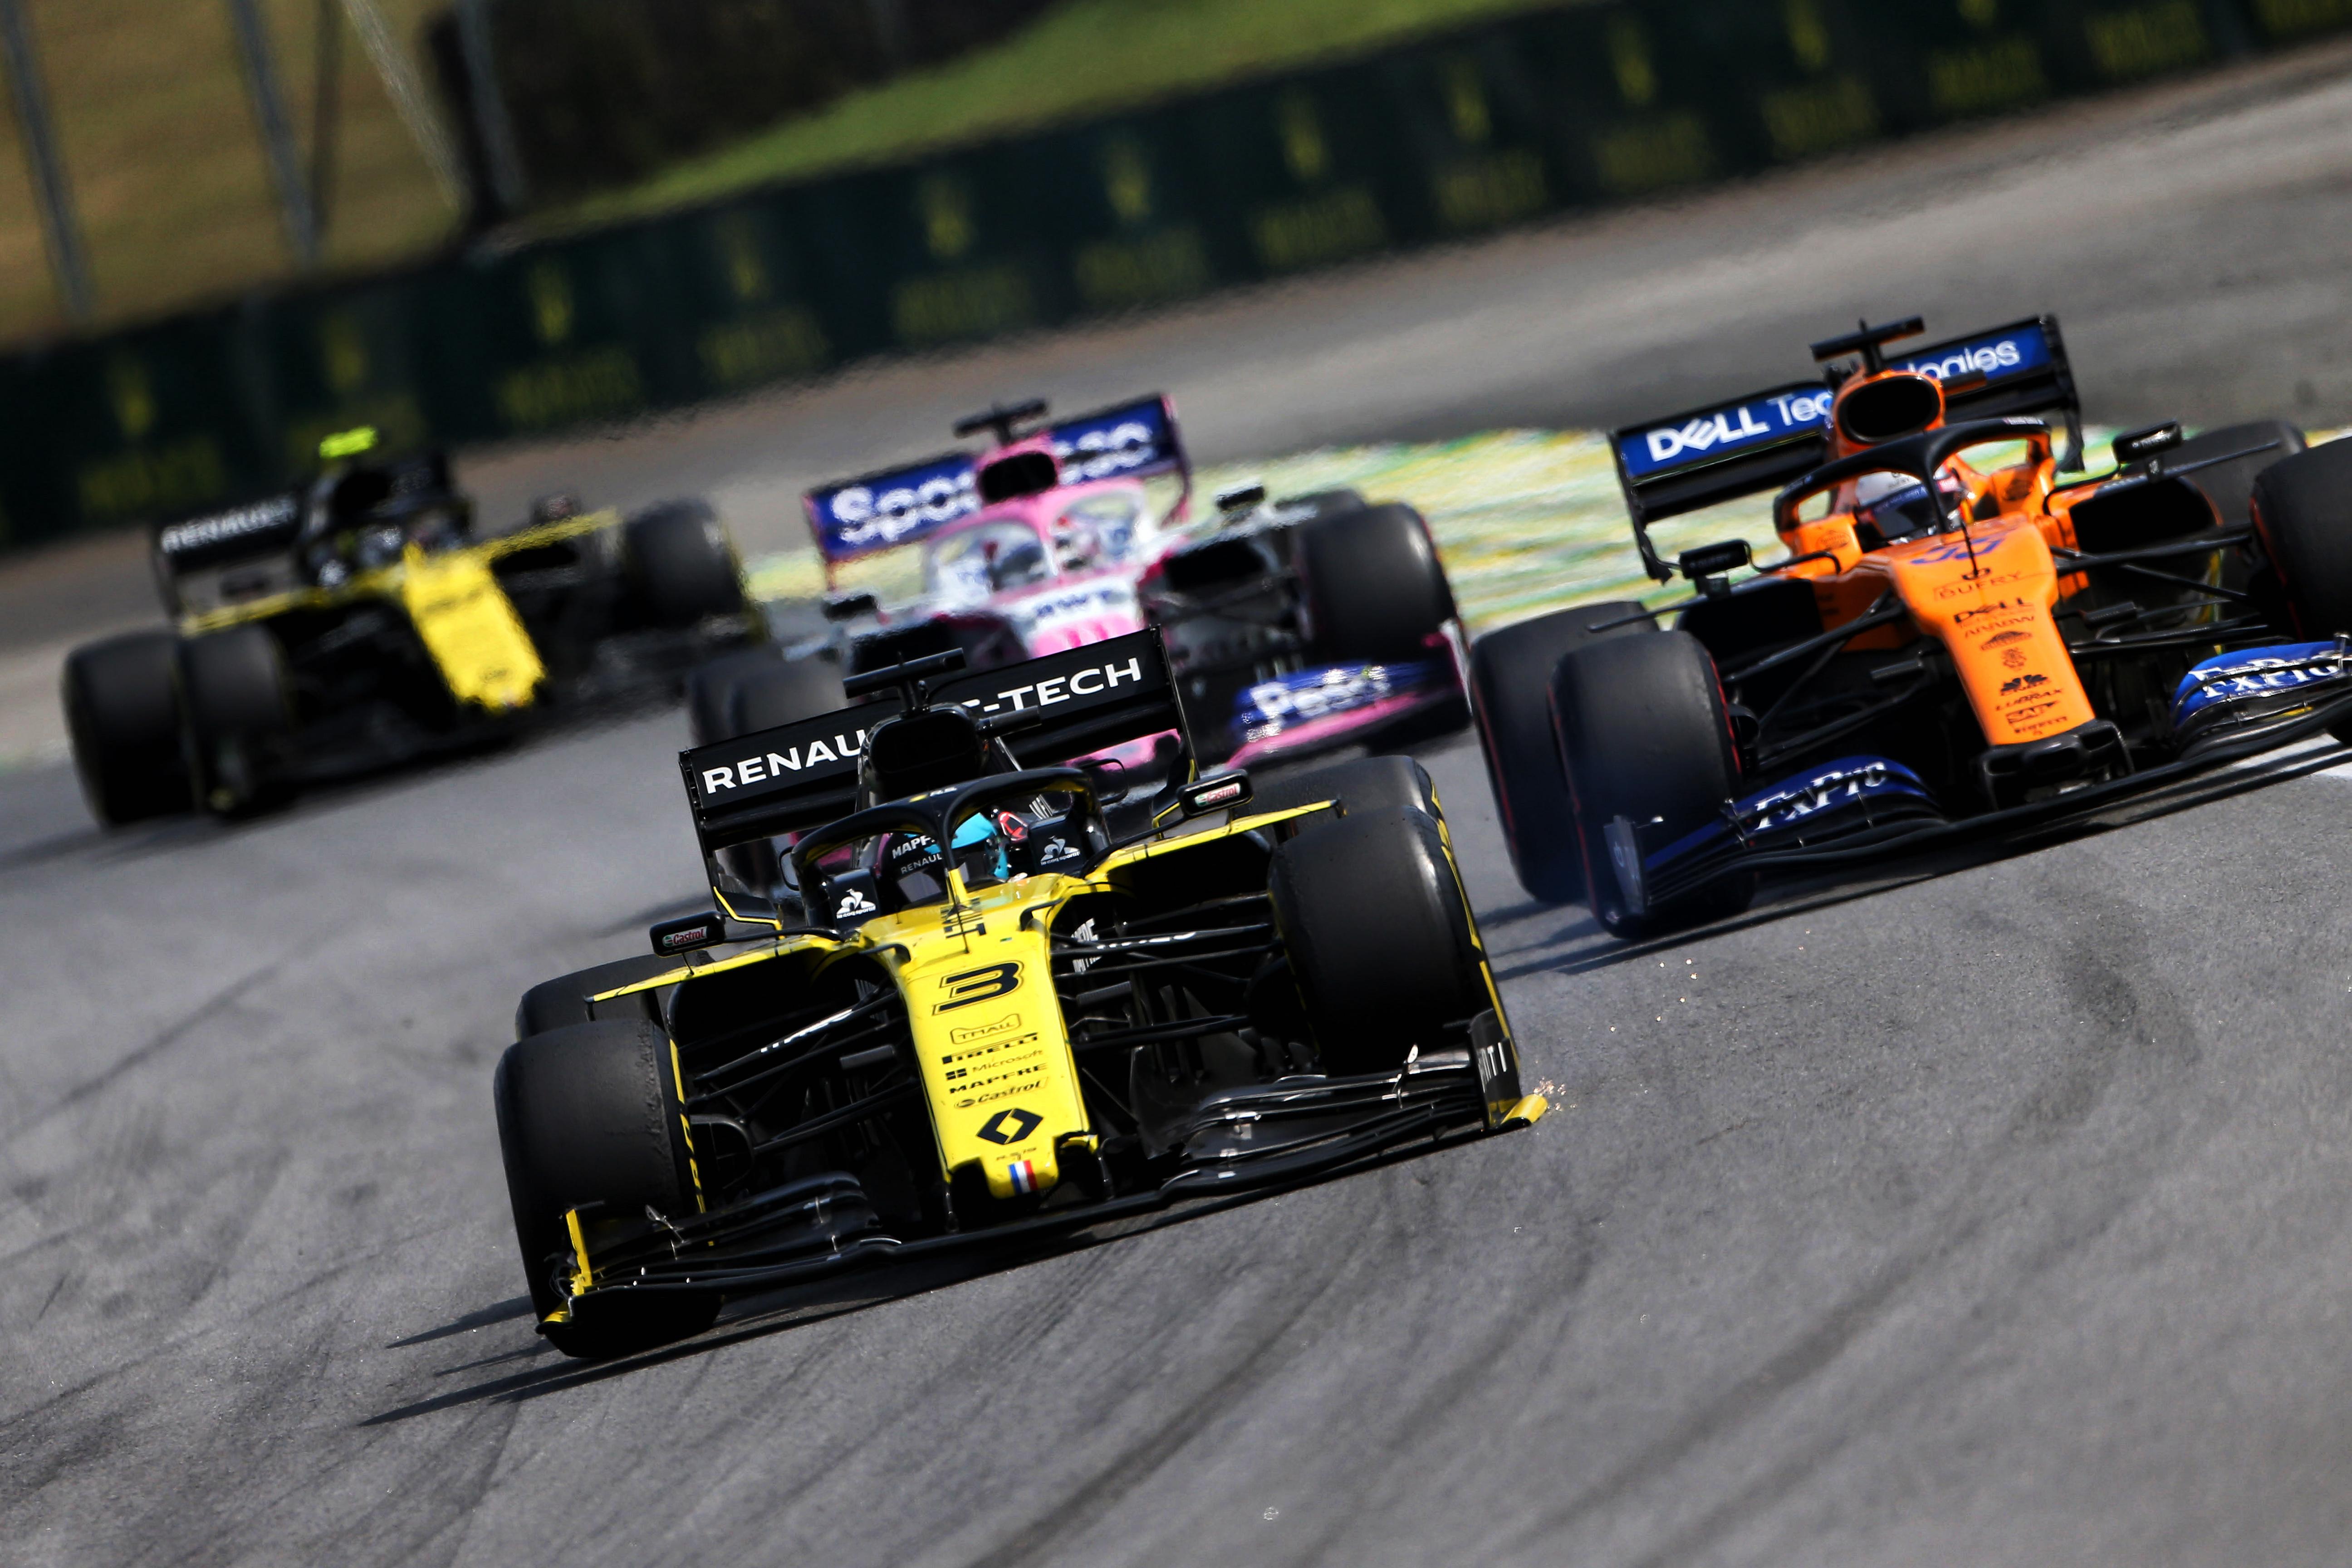 Daniel Ricciardo Renault Brazilian Grand Prix 2019 Interlagos